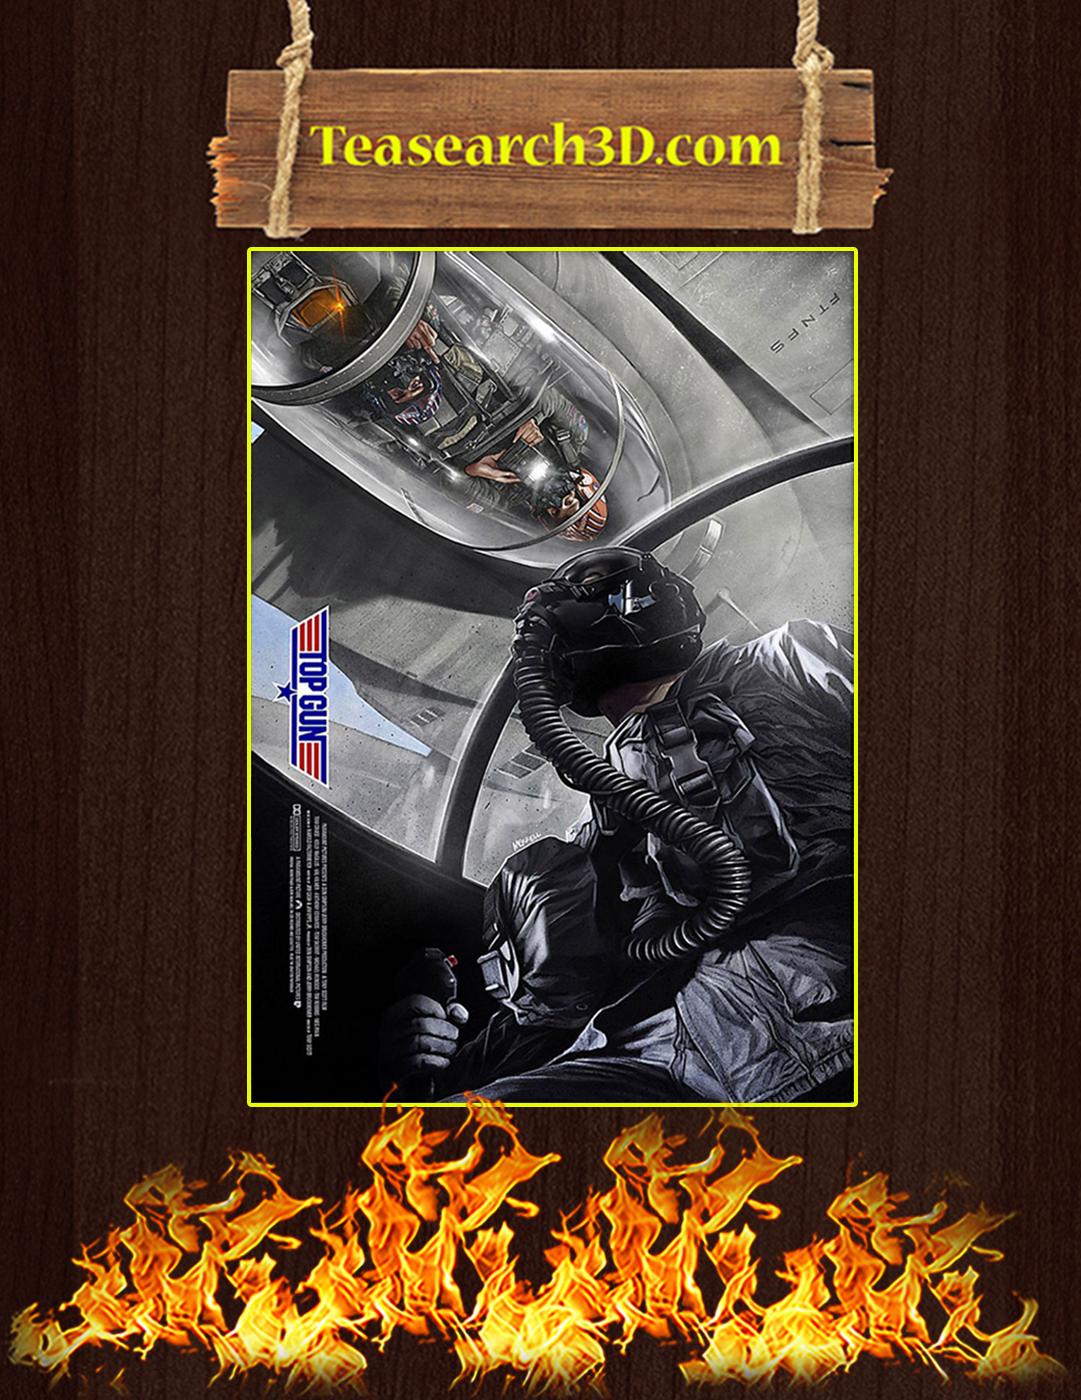 Top gun flyby poster A2